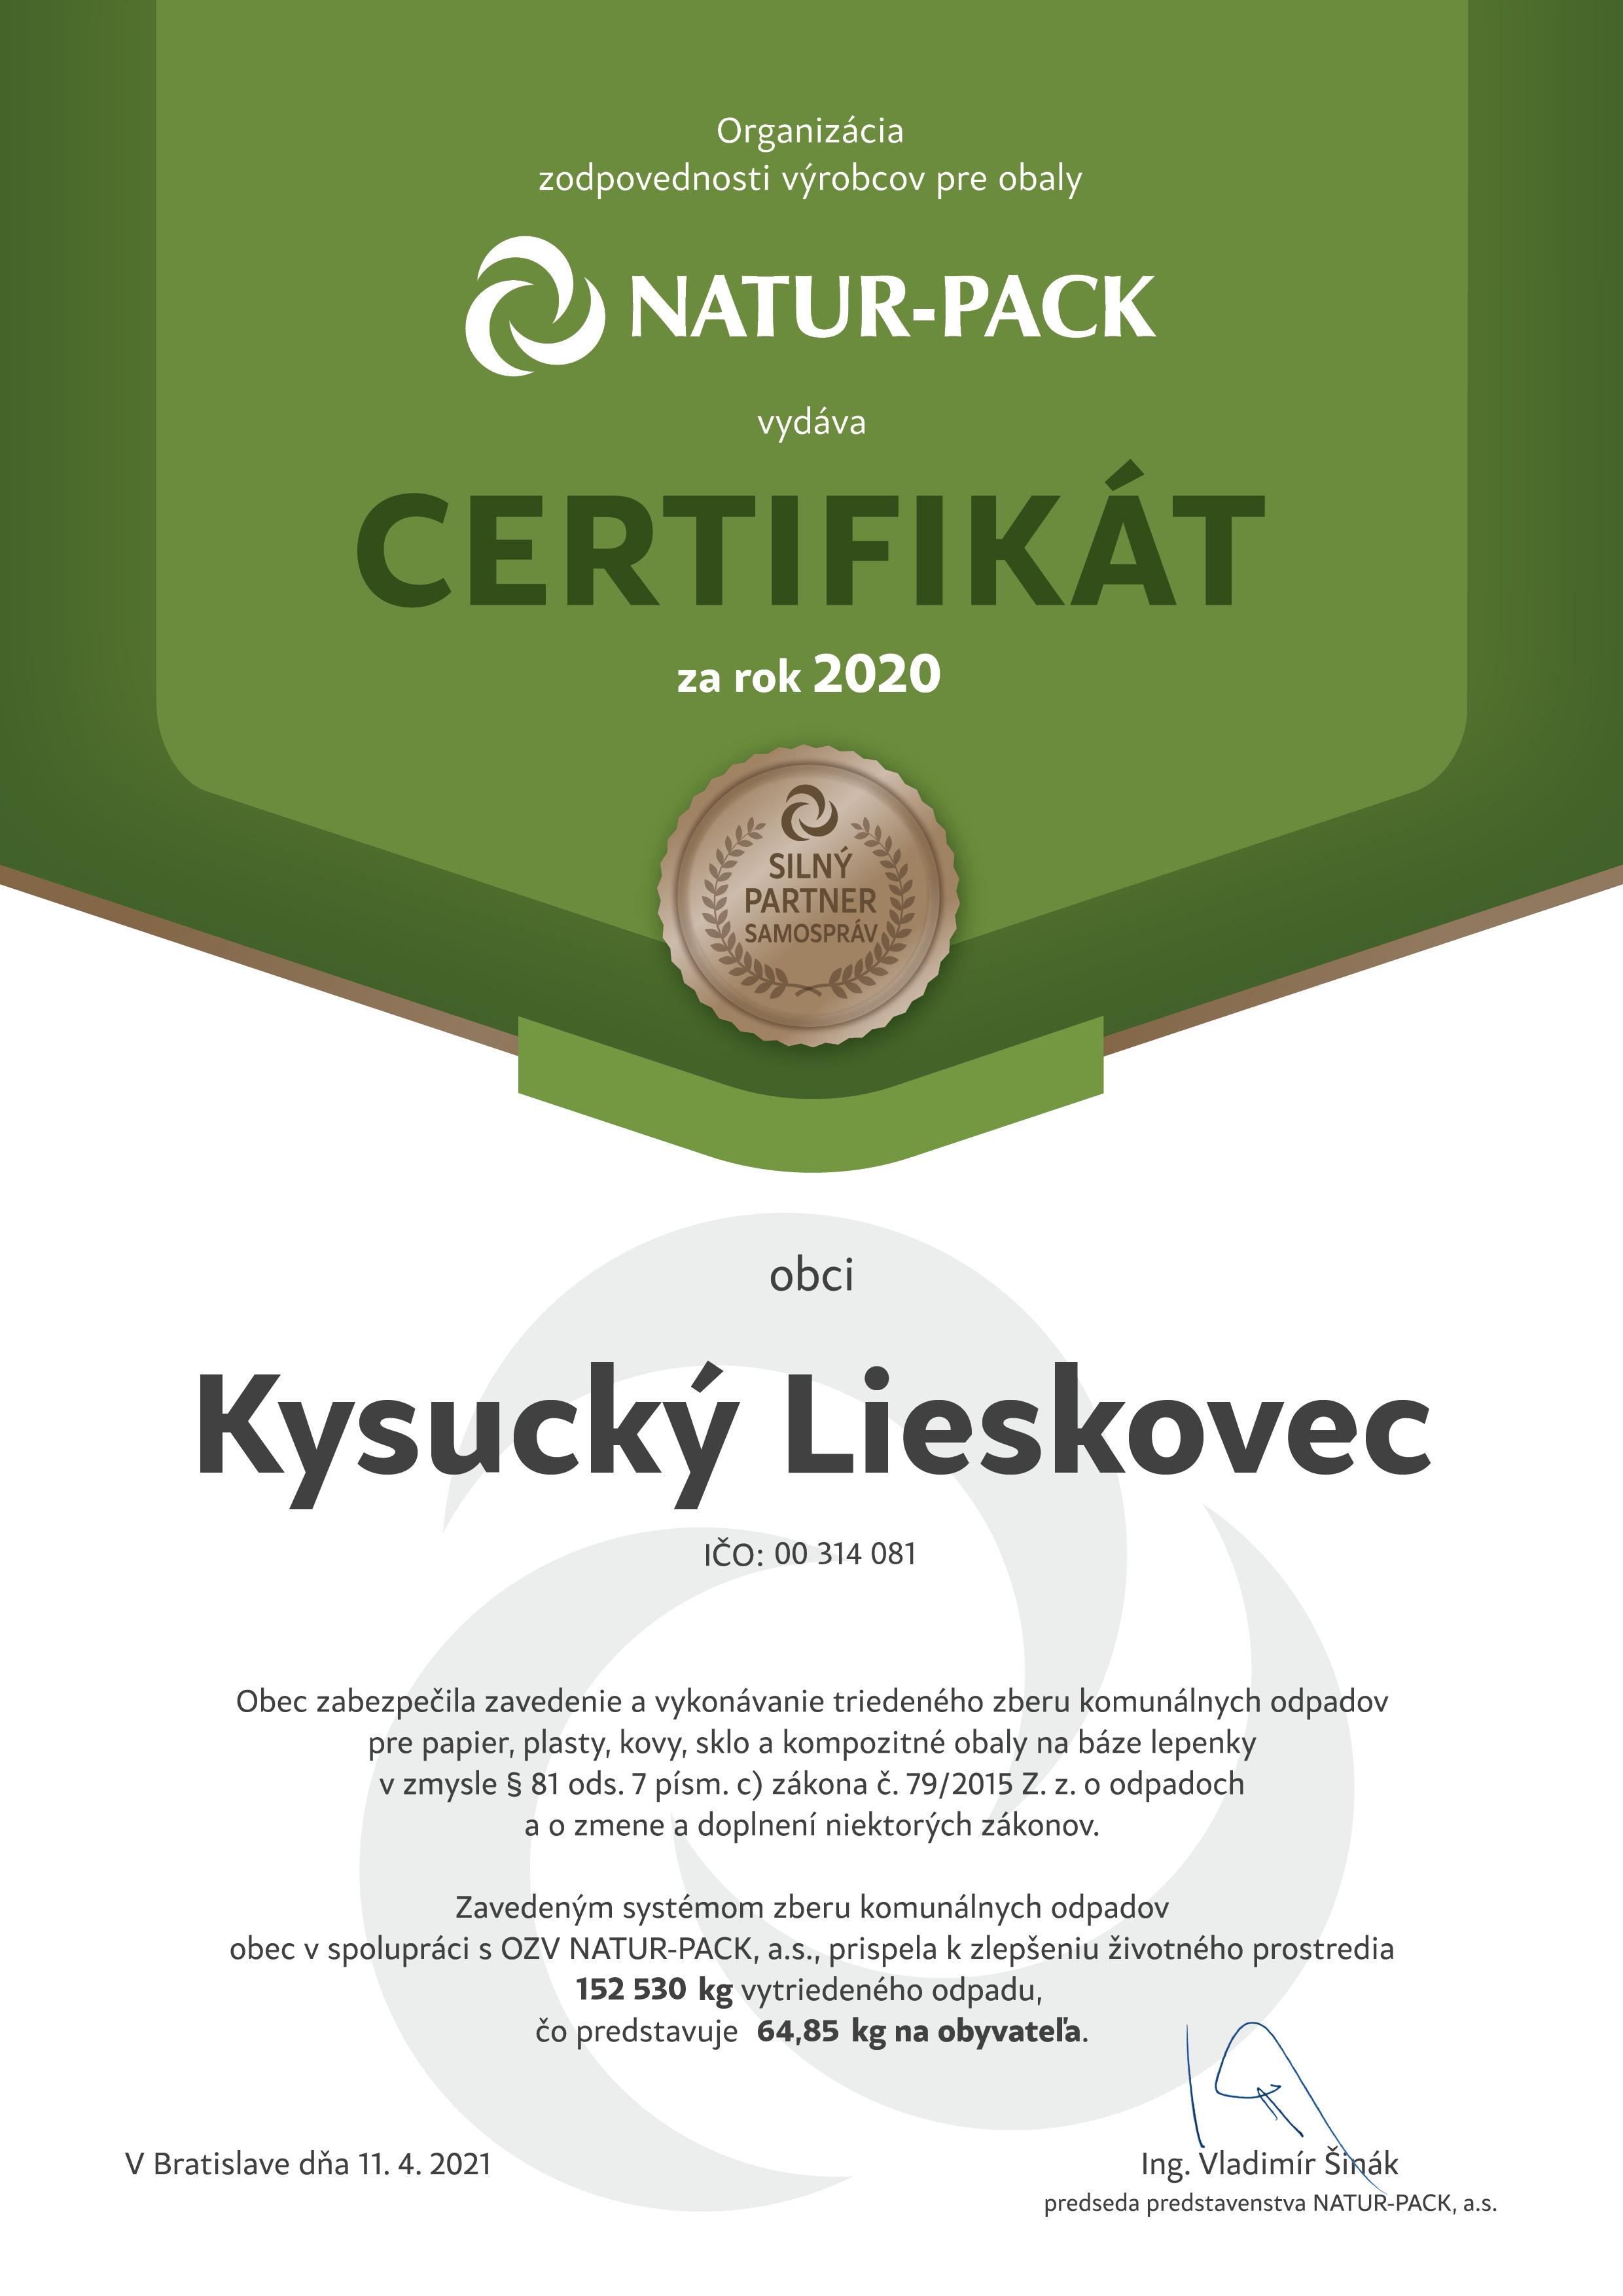 Certifikát za rok 2020 NATUR-PACK